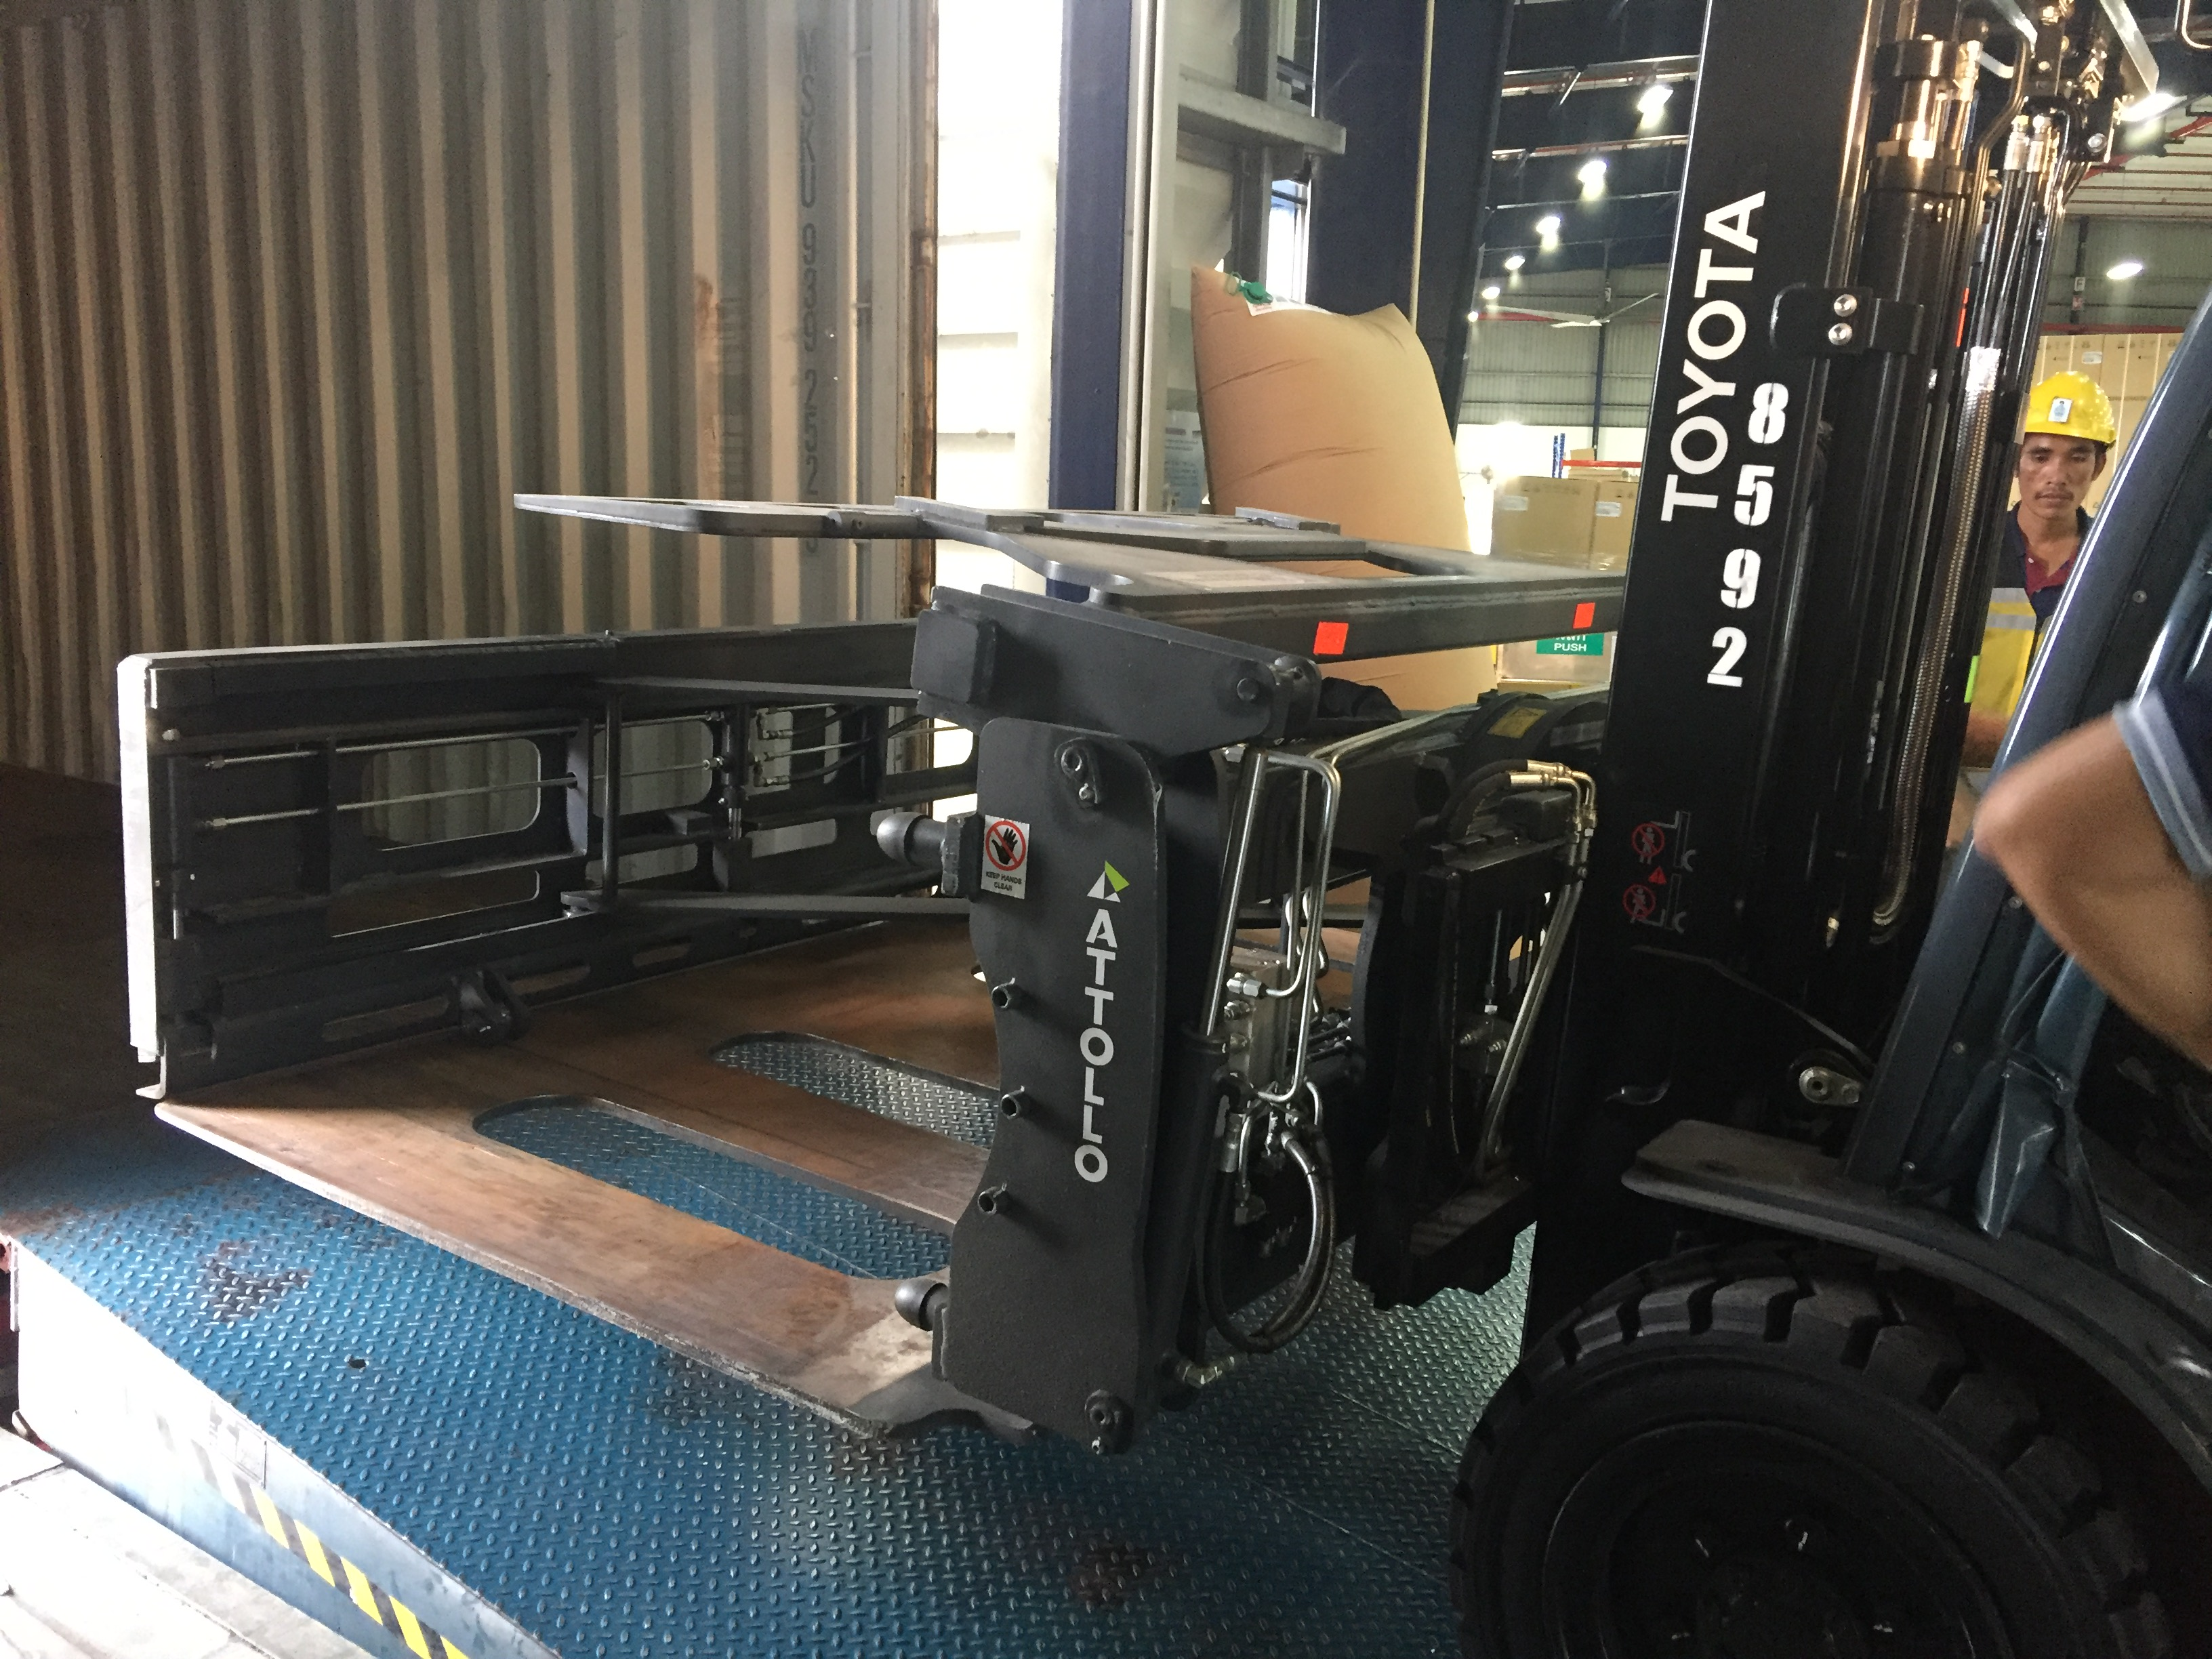 KAUP maximises shipping container capacity